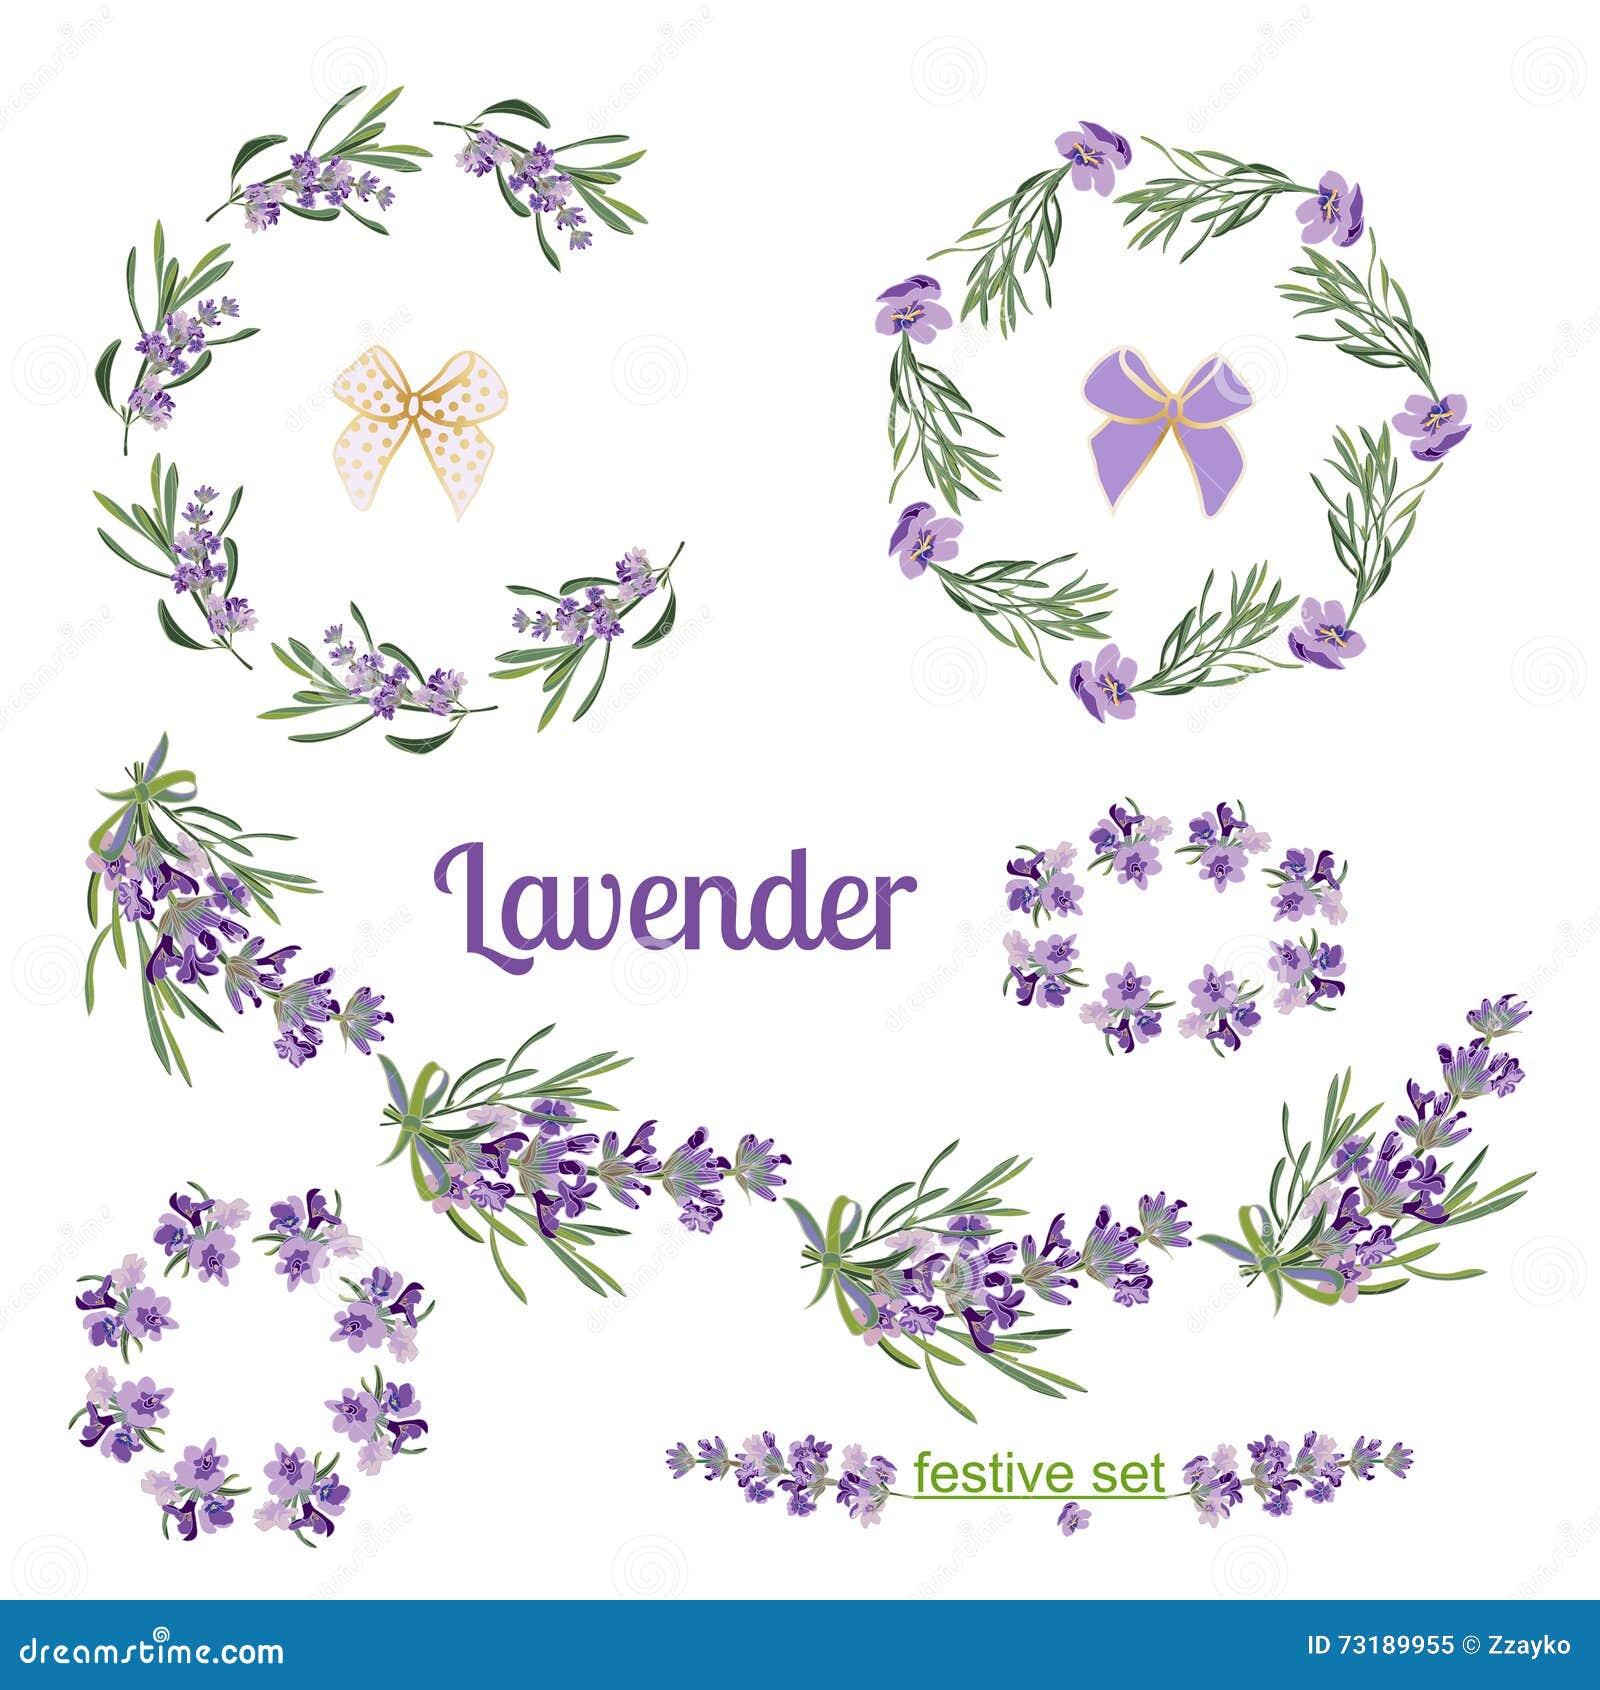 Lavender Flowers Elements Botanical Illustration Royalty